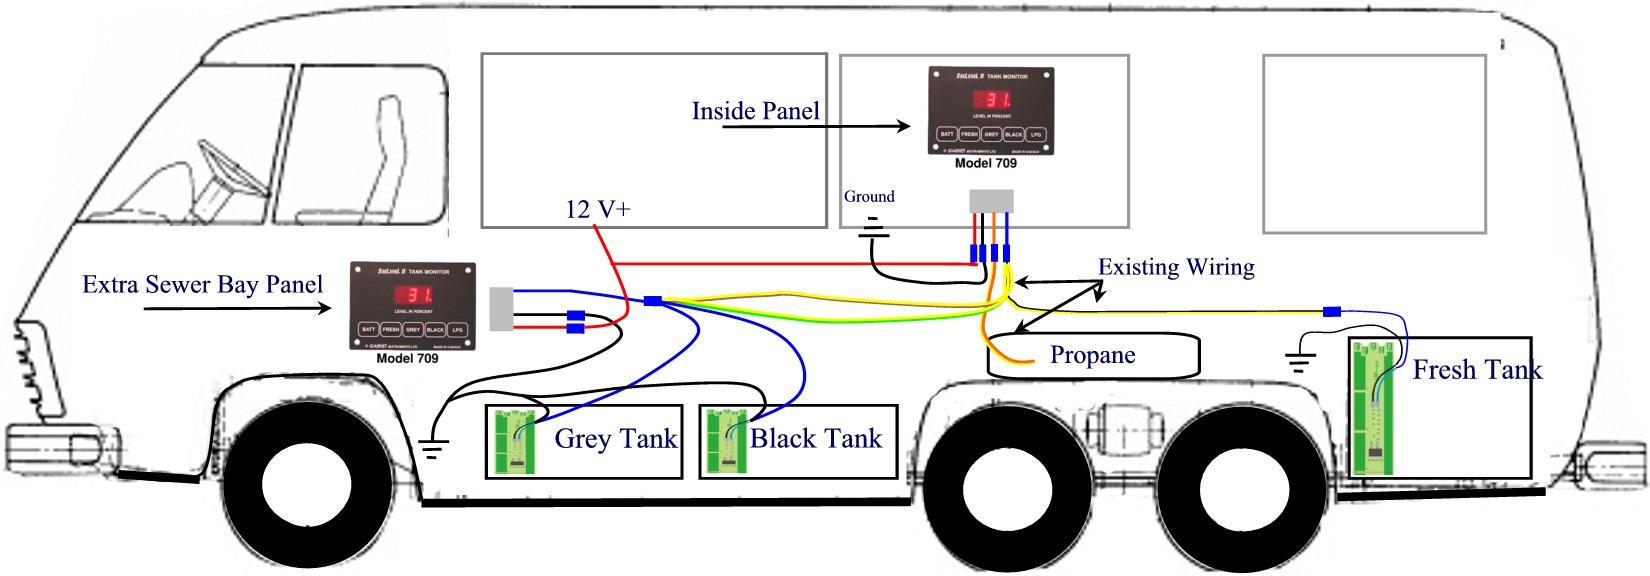 Kib Rv Monitor Panel Wiring Diagram Seelevel Rv Tank Monitoring System